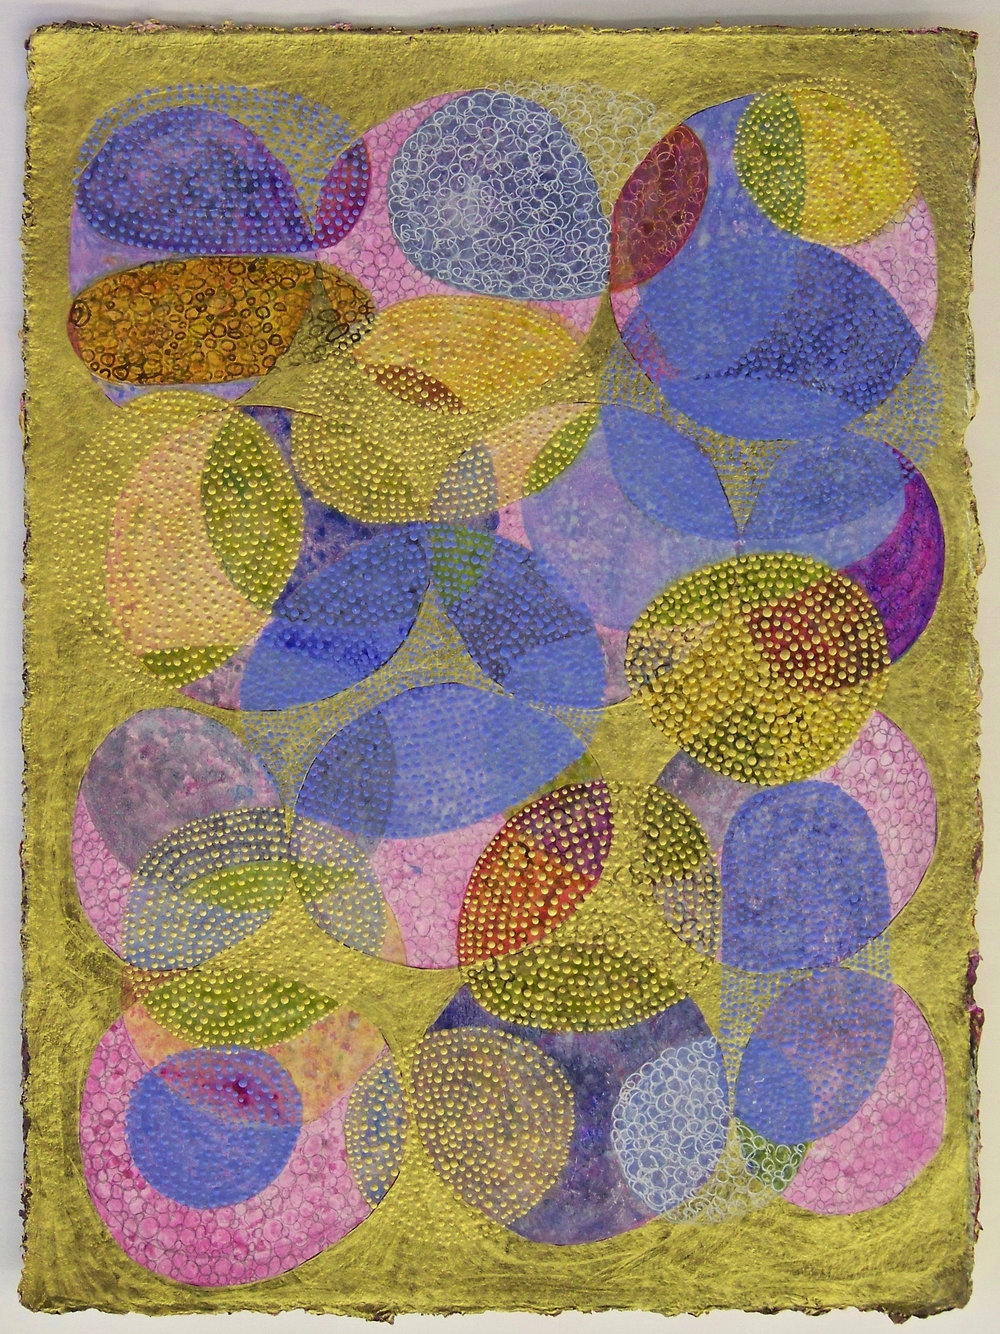 D. Driscoll,  Inner Garden 04 , acrylic on paper, 16x12, $500